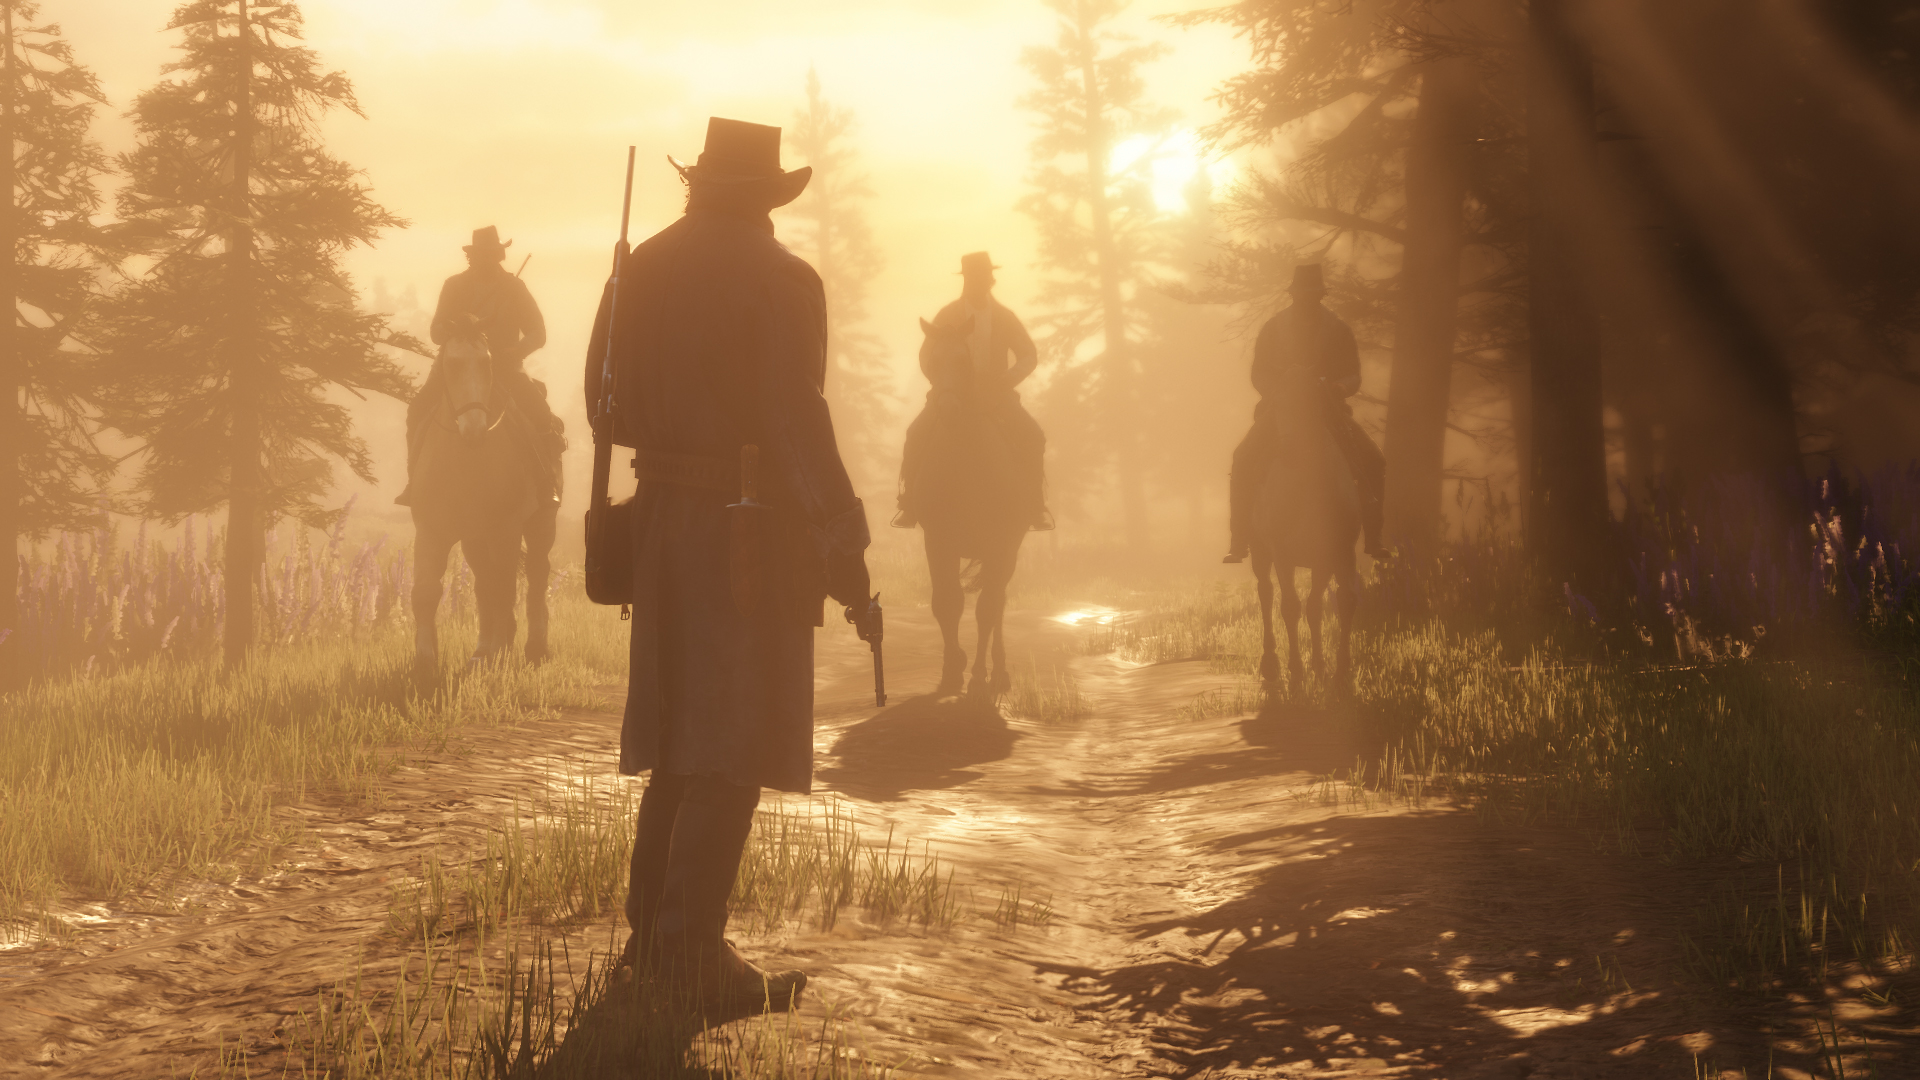 Red Dead Redemption 2's challenges aren't worth the effort - Polygon